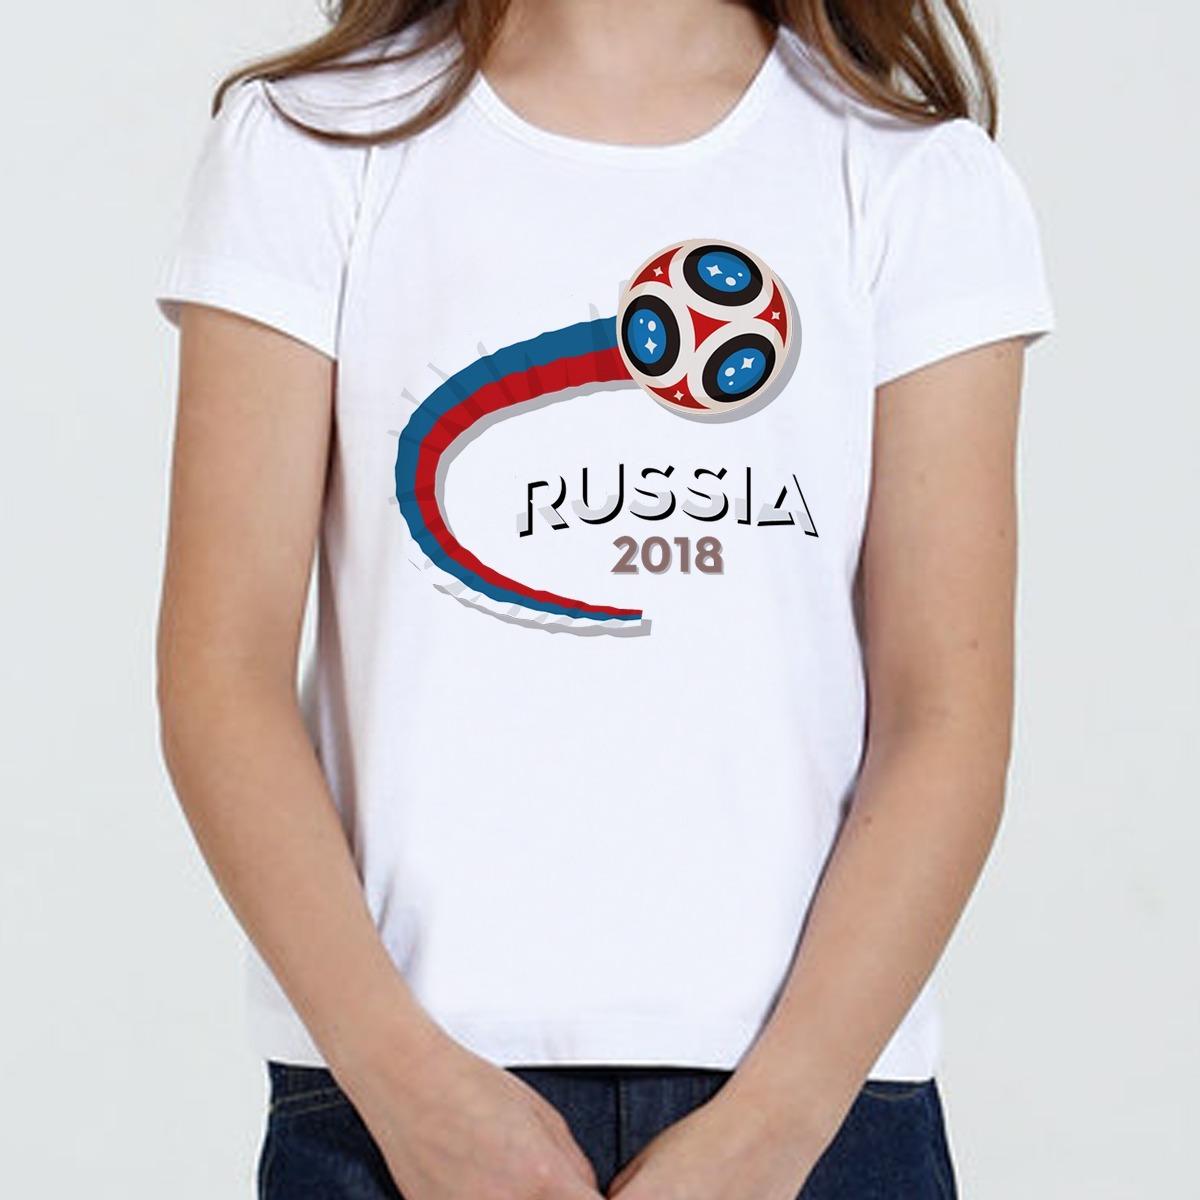 fed7a82b9f02d camiseta infantil feminina - russia world cup 2018. Carregando zoom.